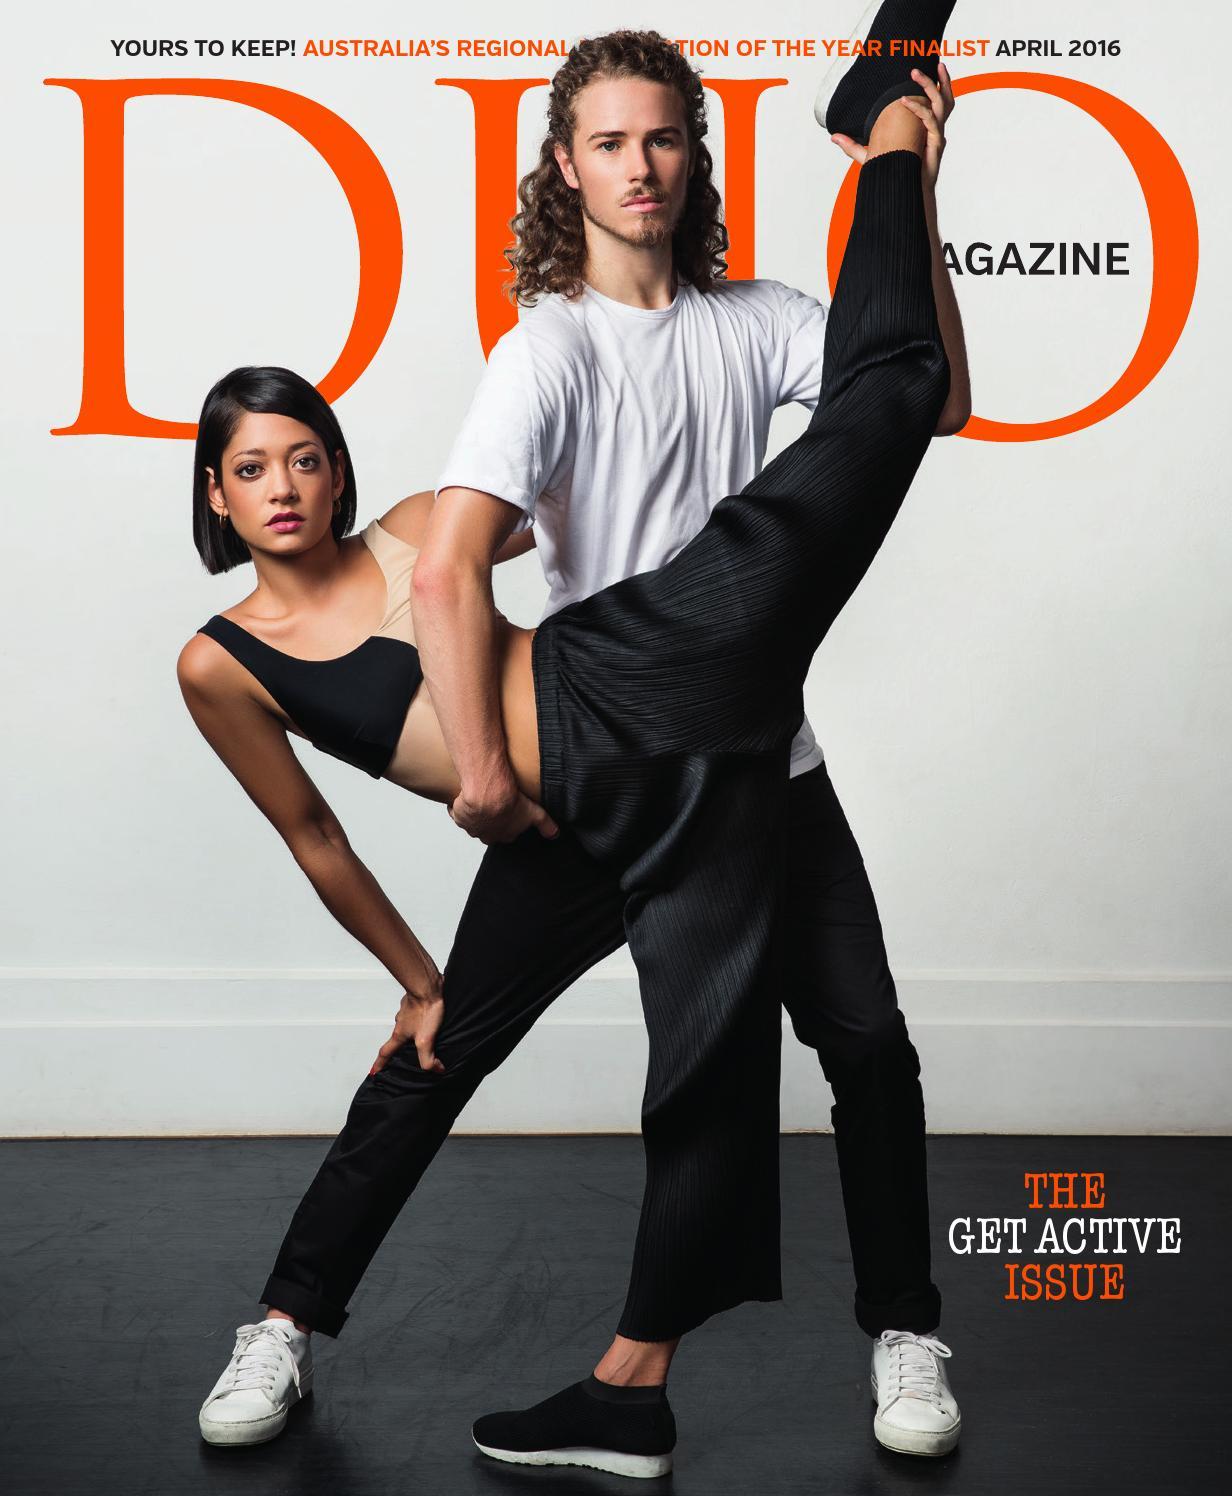 Duo Magazine April 2016 By Issuu Dance Footprint Diagrams Basic Salsa Step Diagram